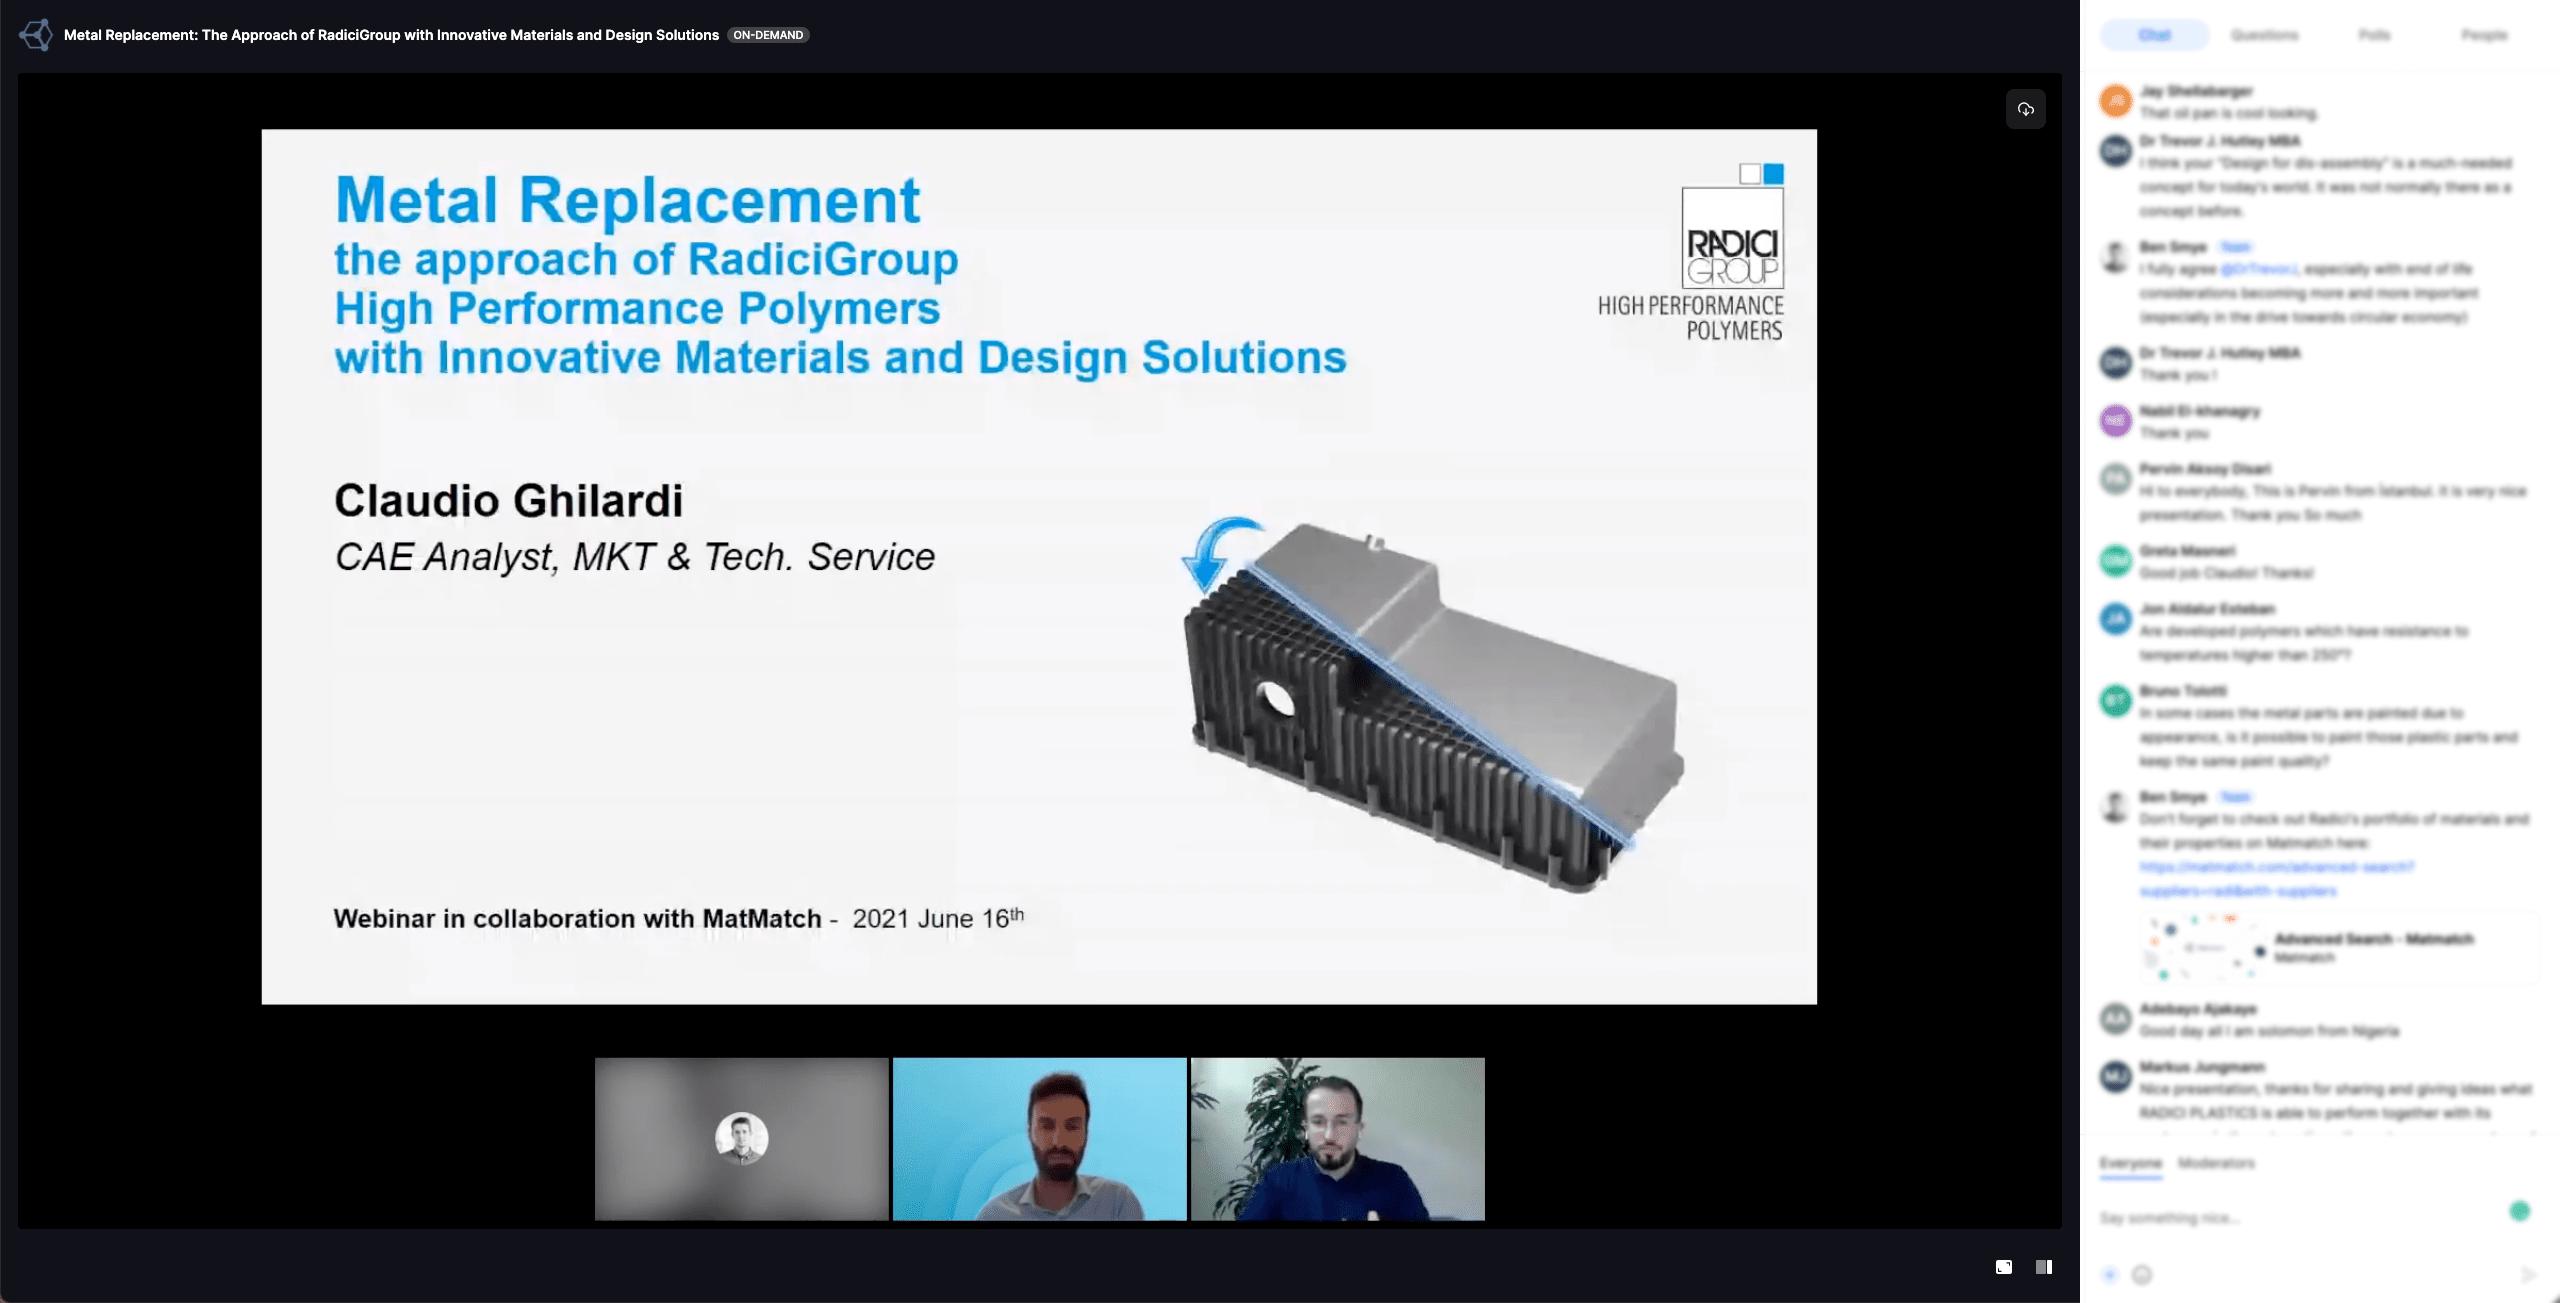 RadiciGroup webinar - screenshot from the webinar